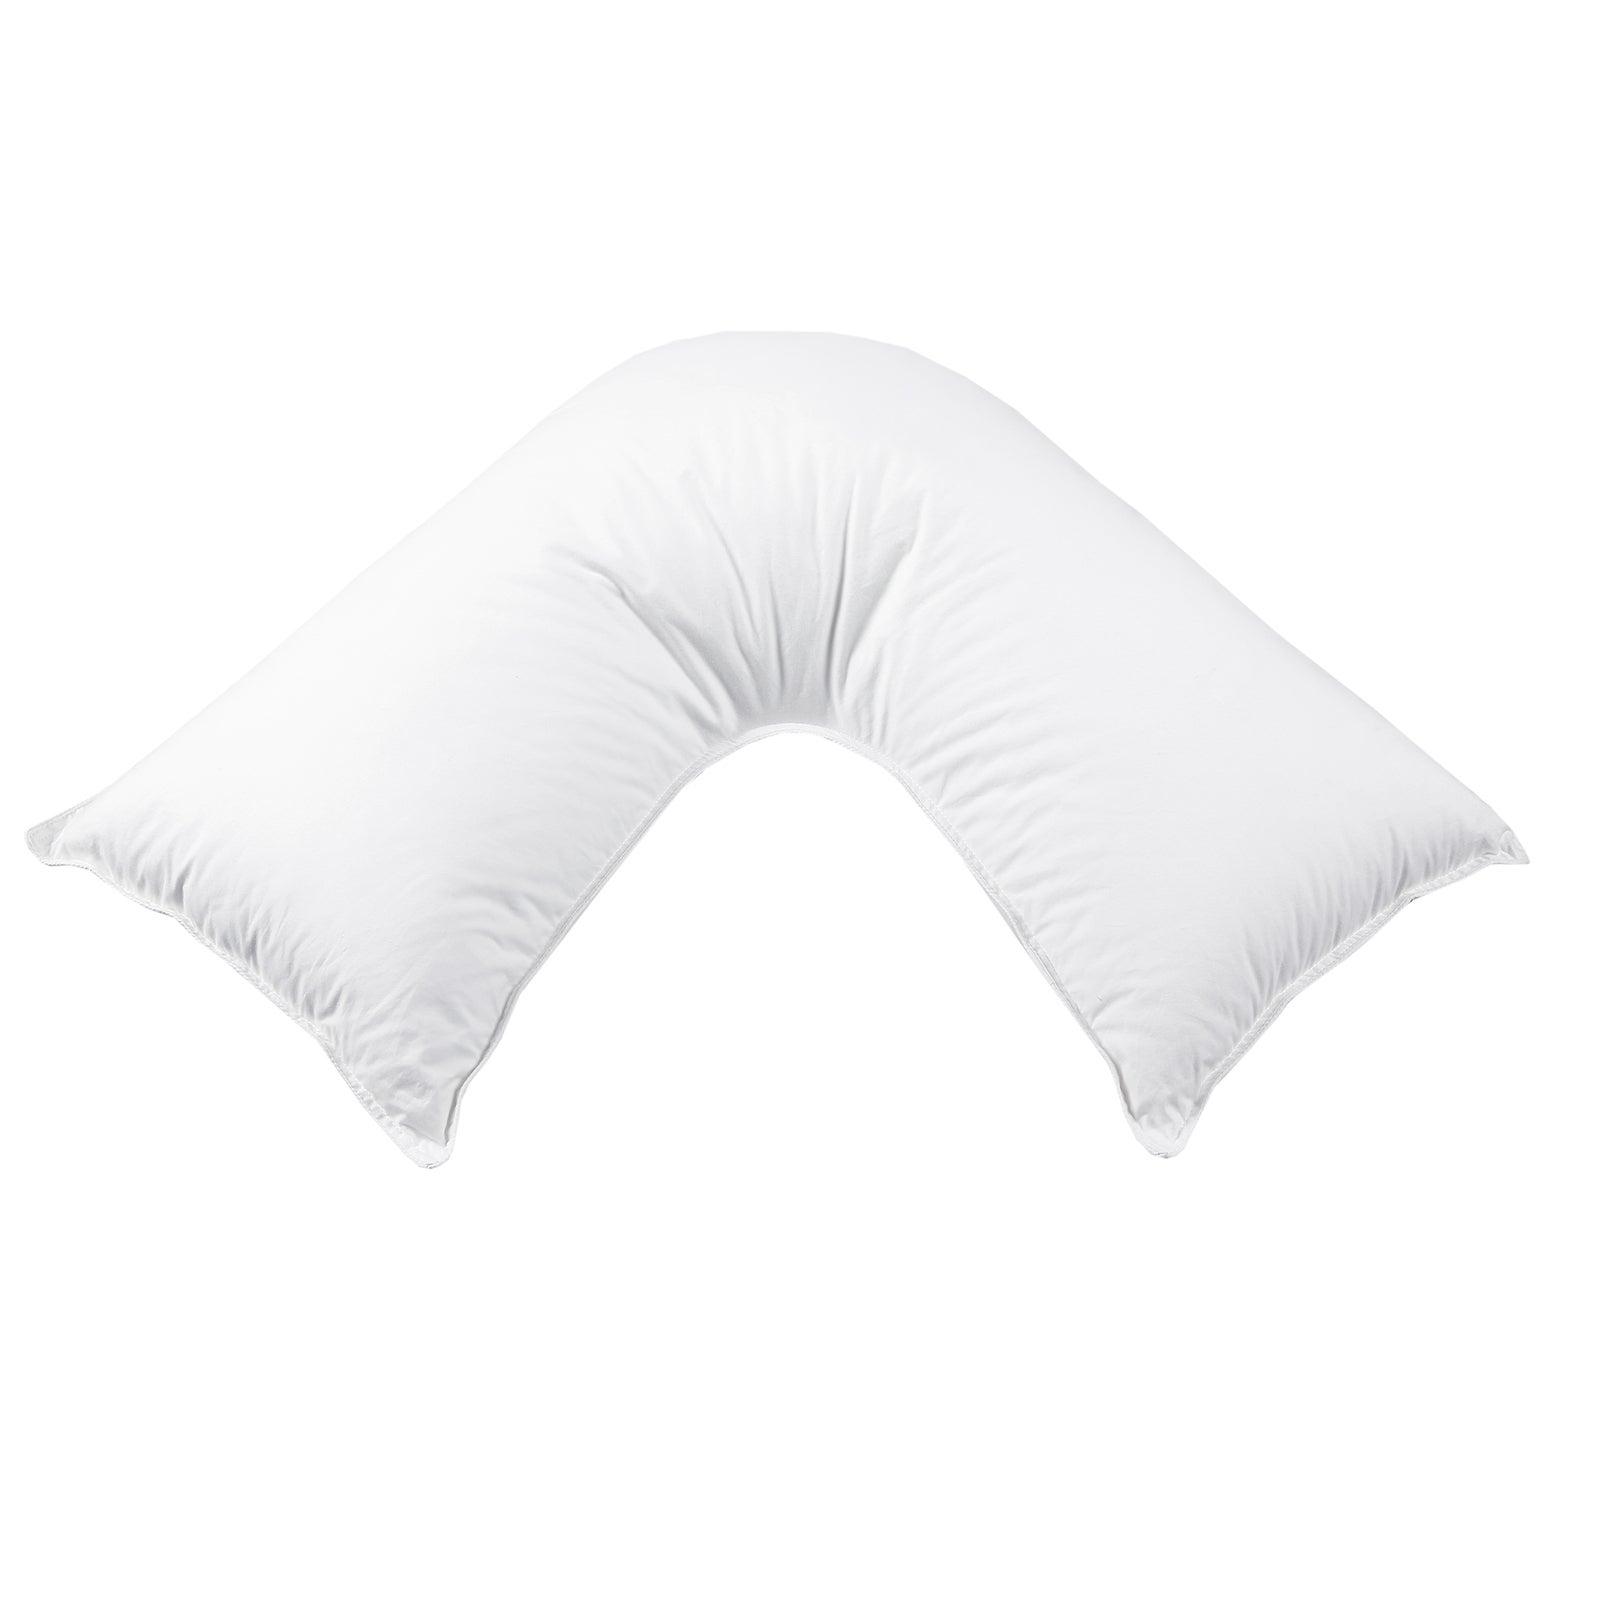 Dreamaker Down Alternative Microfibre V Shape Pillow - 78 X 78 Cm